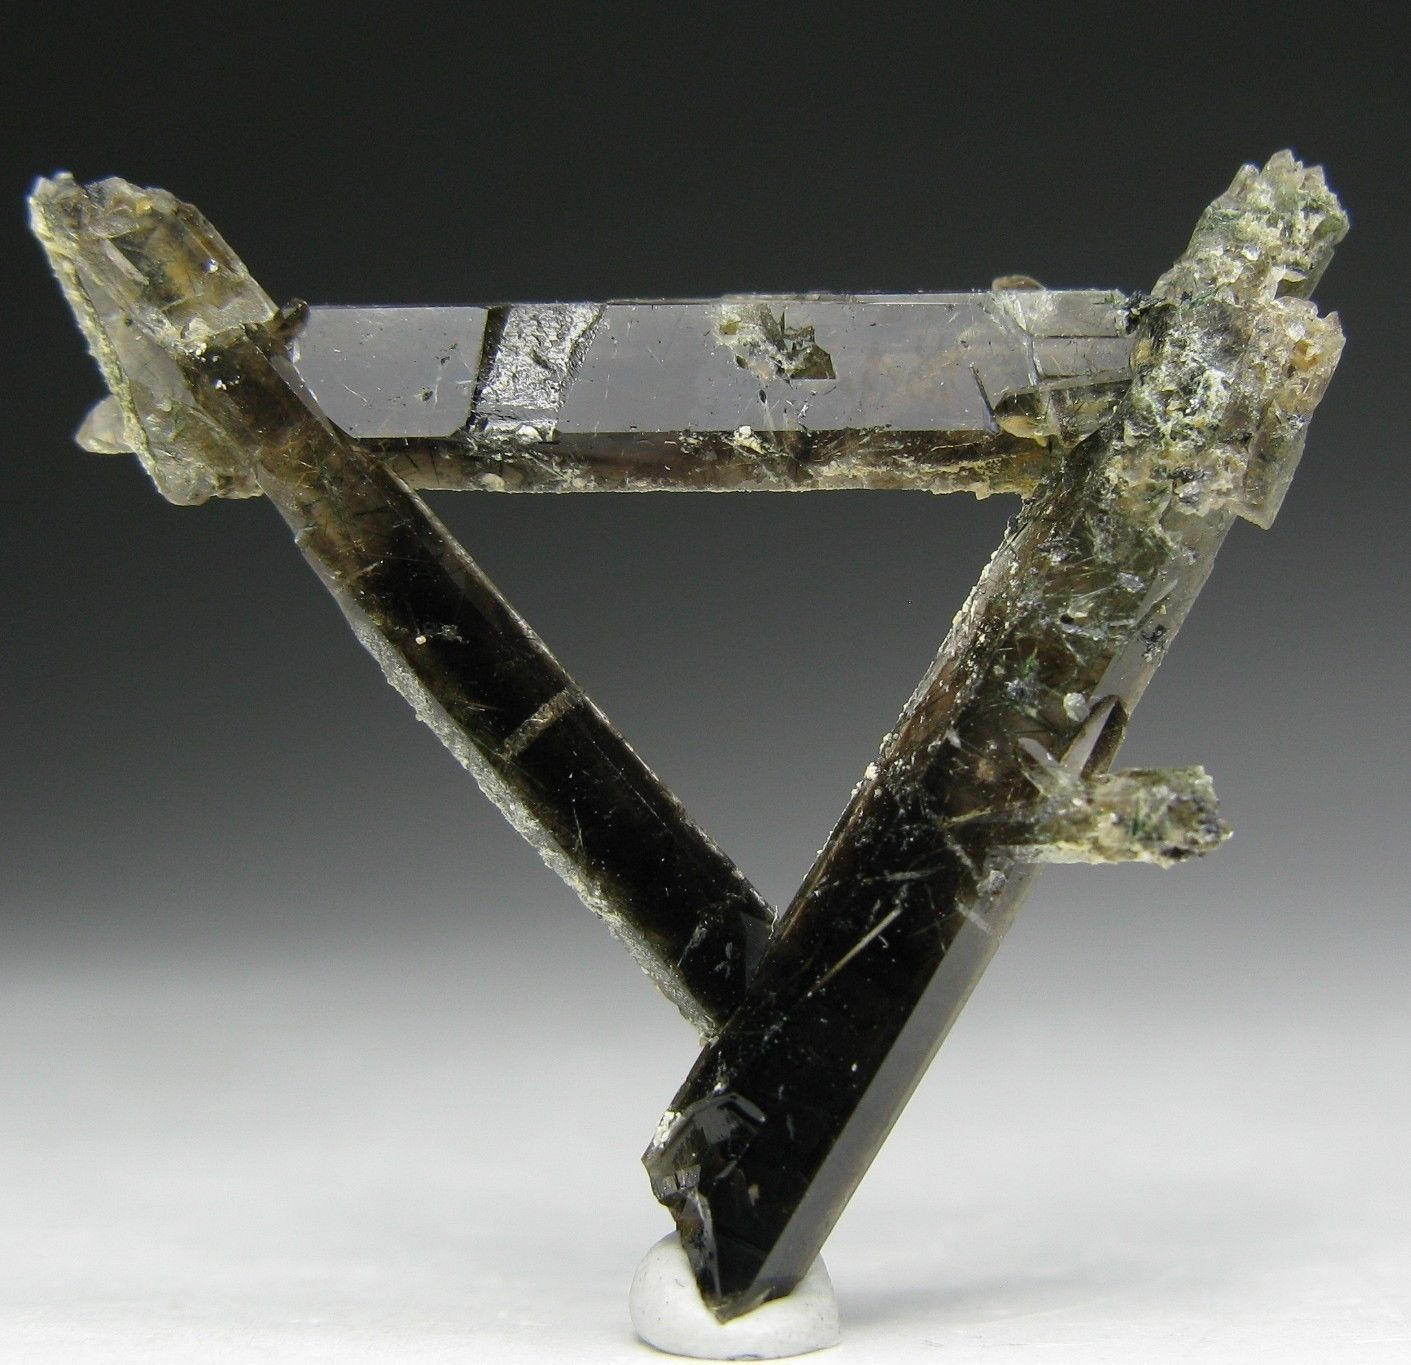 Three connected SMOKY QUARTZ crystals ~ Mt. Malosa * Malawi